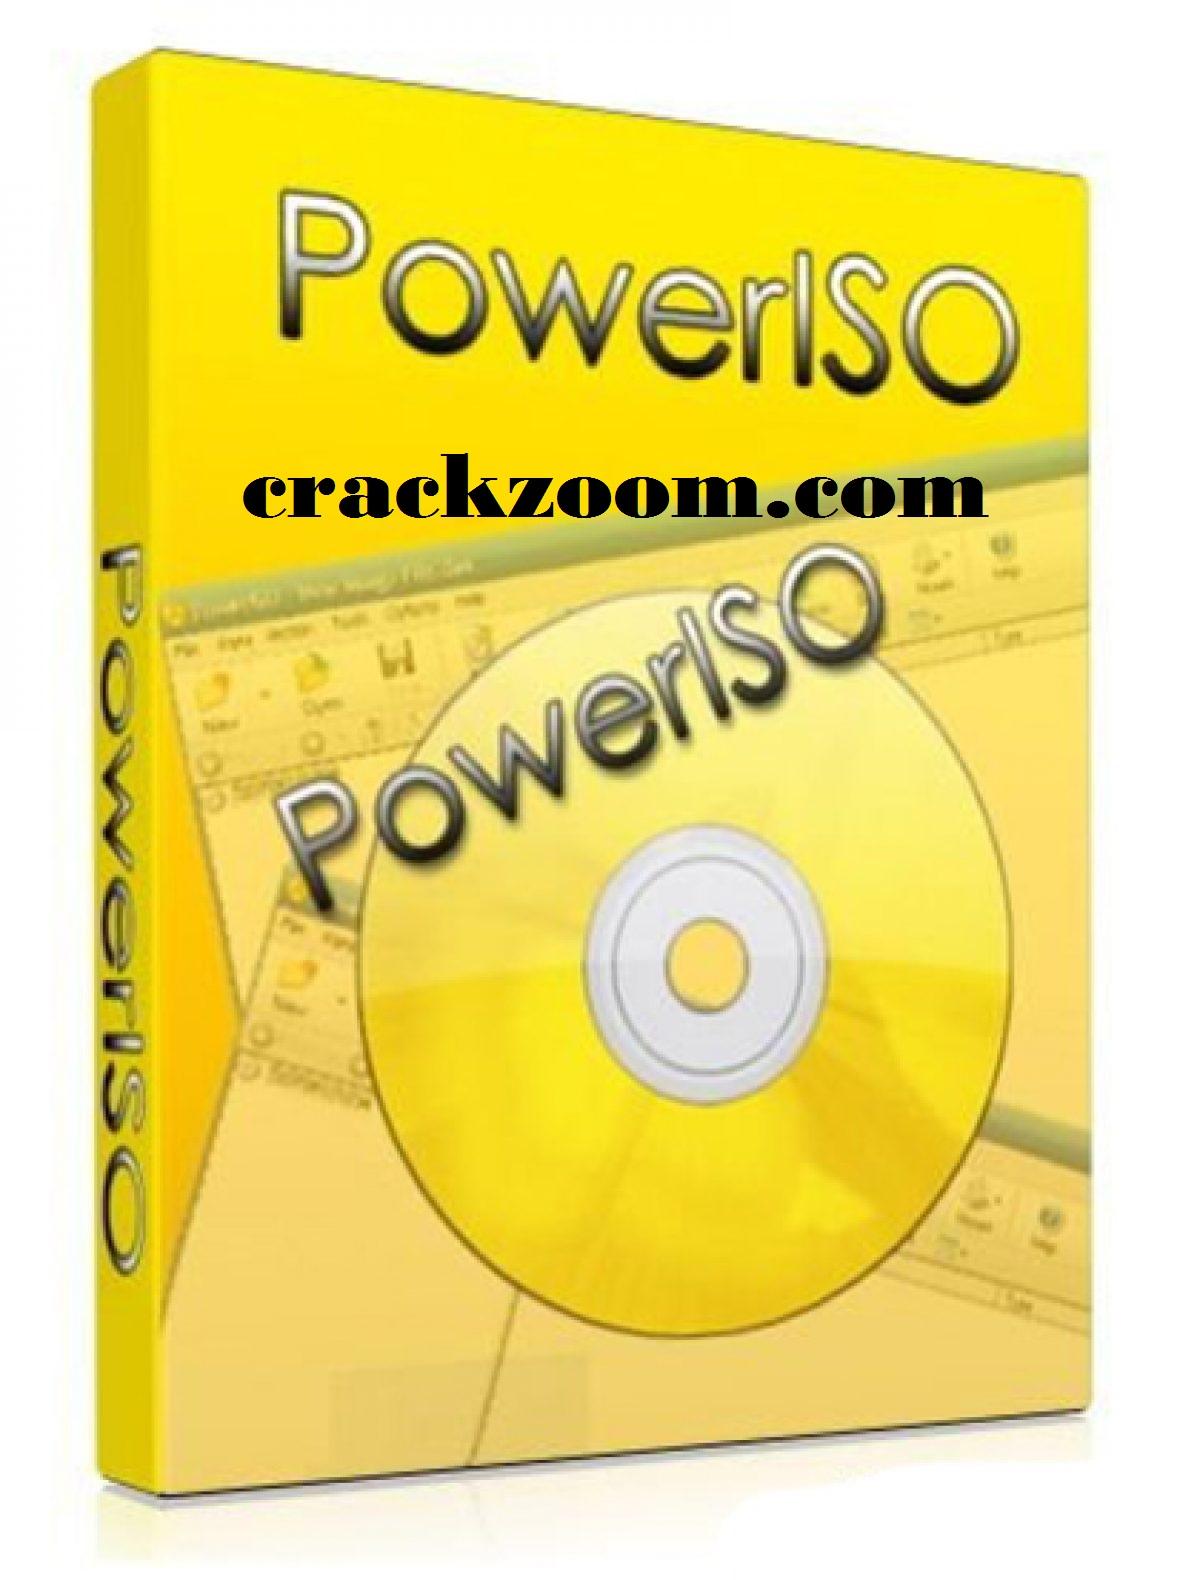 PowerISO 7.6 Crack + Registration Code 2020 {32/64 Bit} Latest